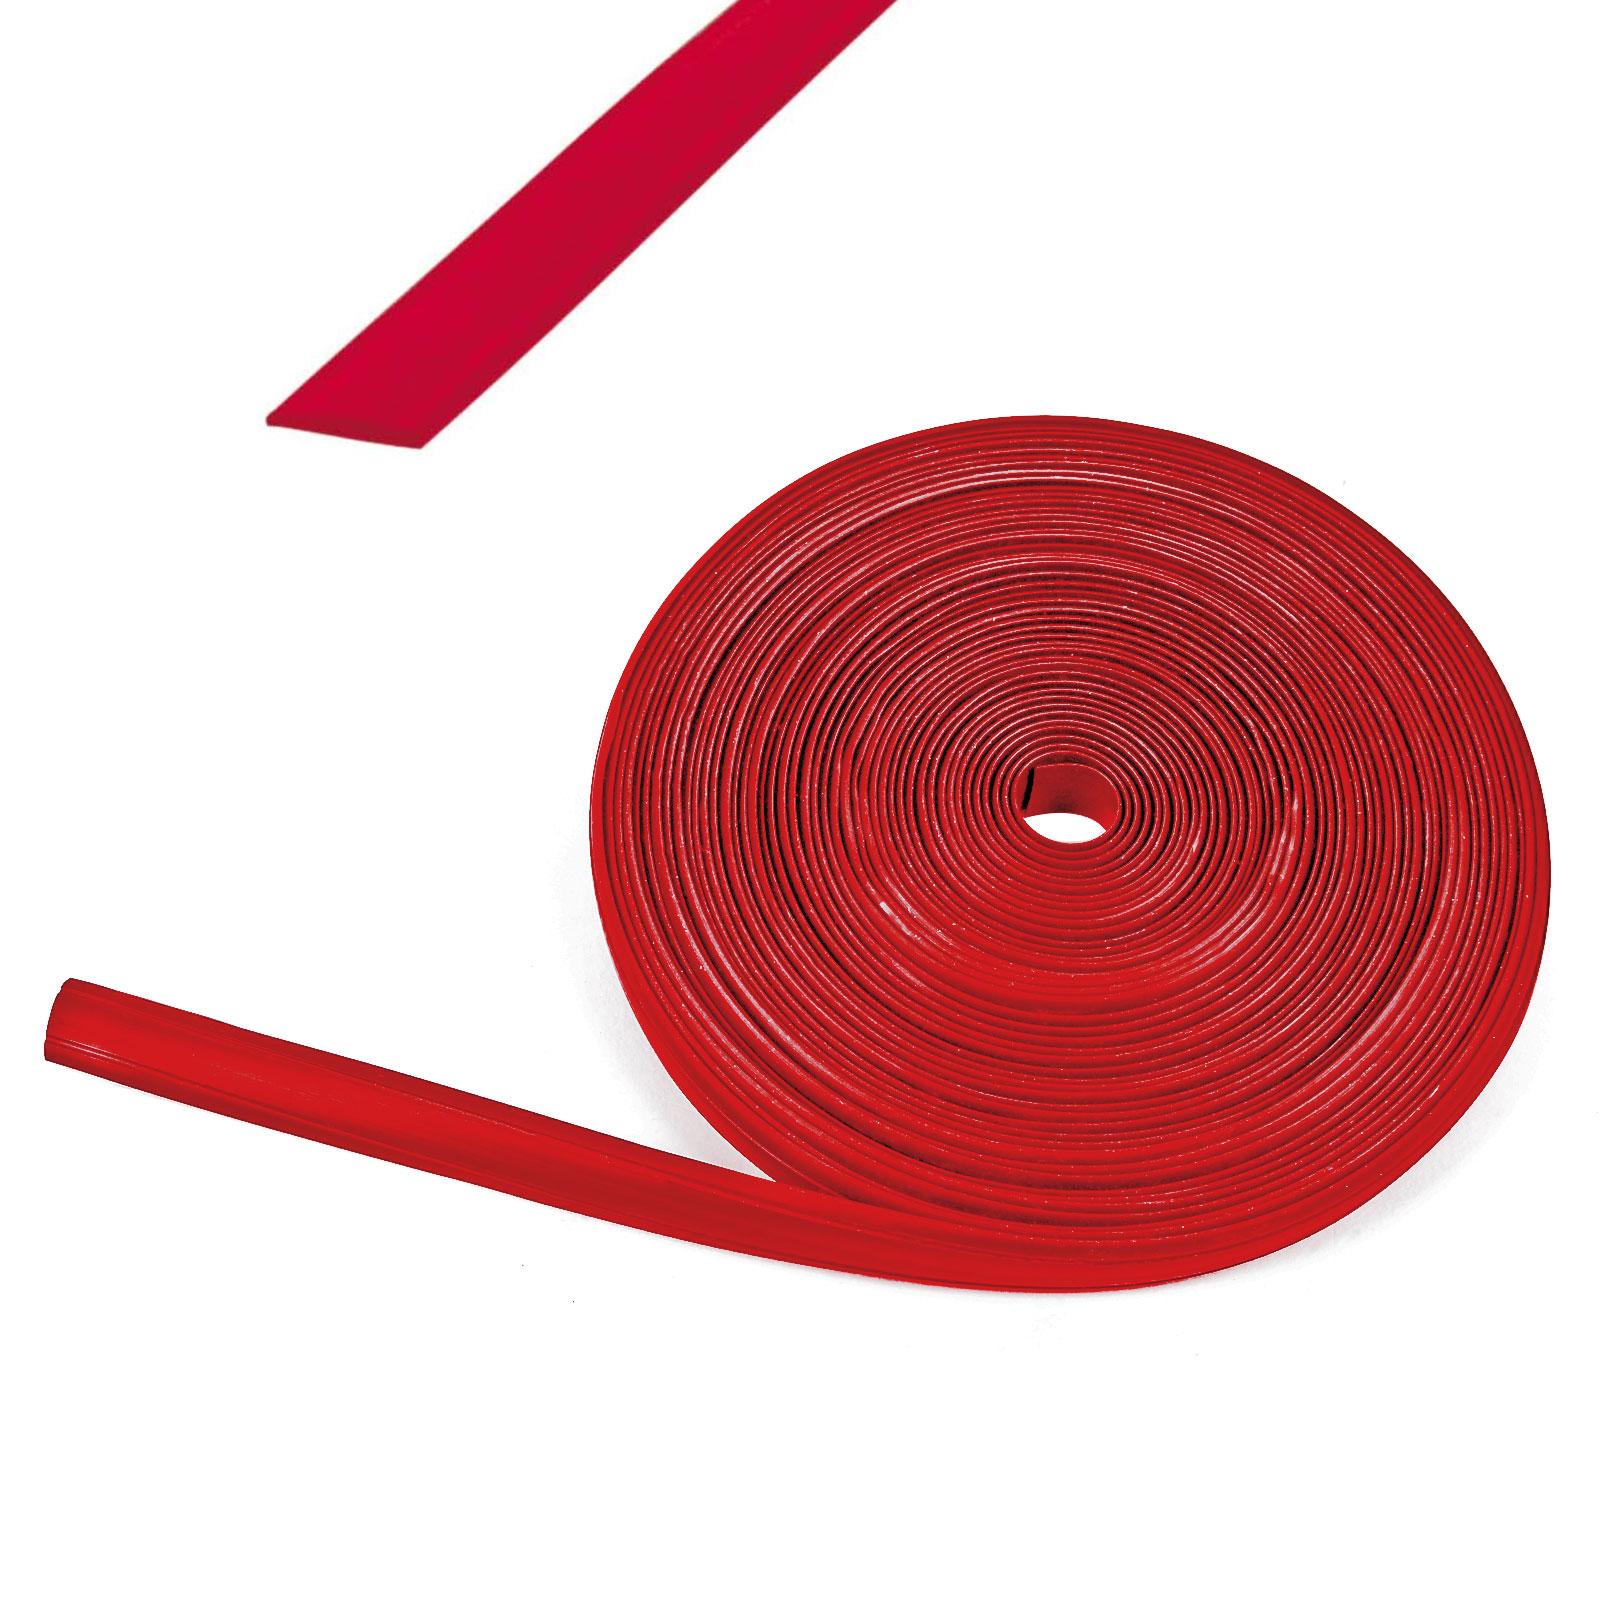 60 Meter (6x10 m) Kederband 12 mm rot Kunststoff Leistenfüller RAL 3003